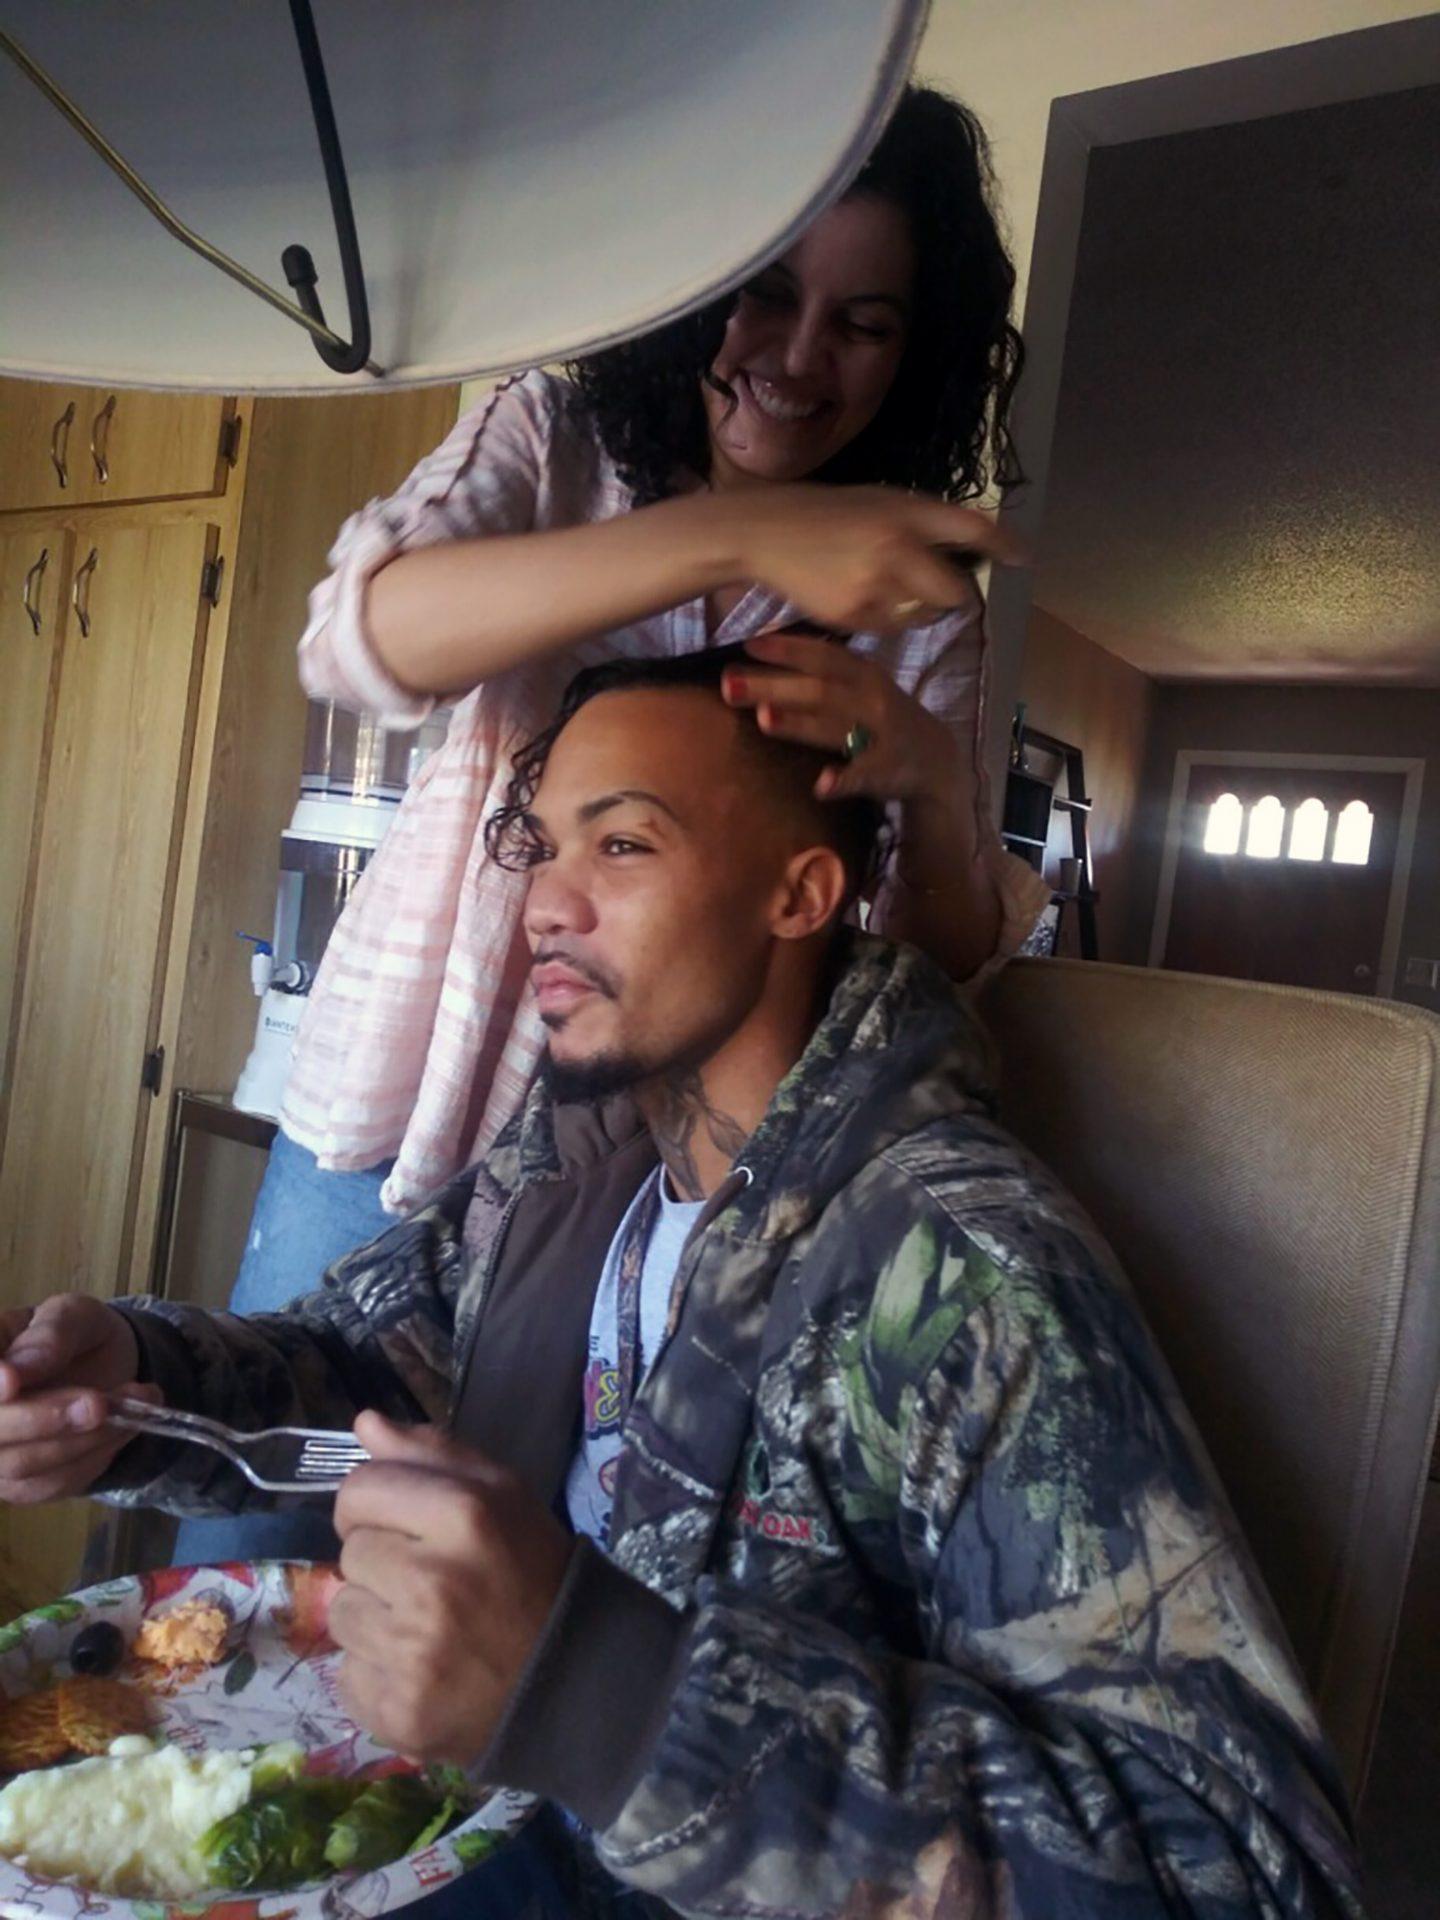 Gettin his hair did by Lan